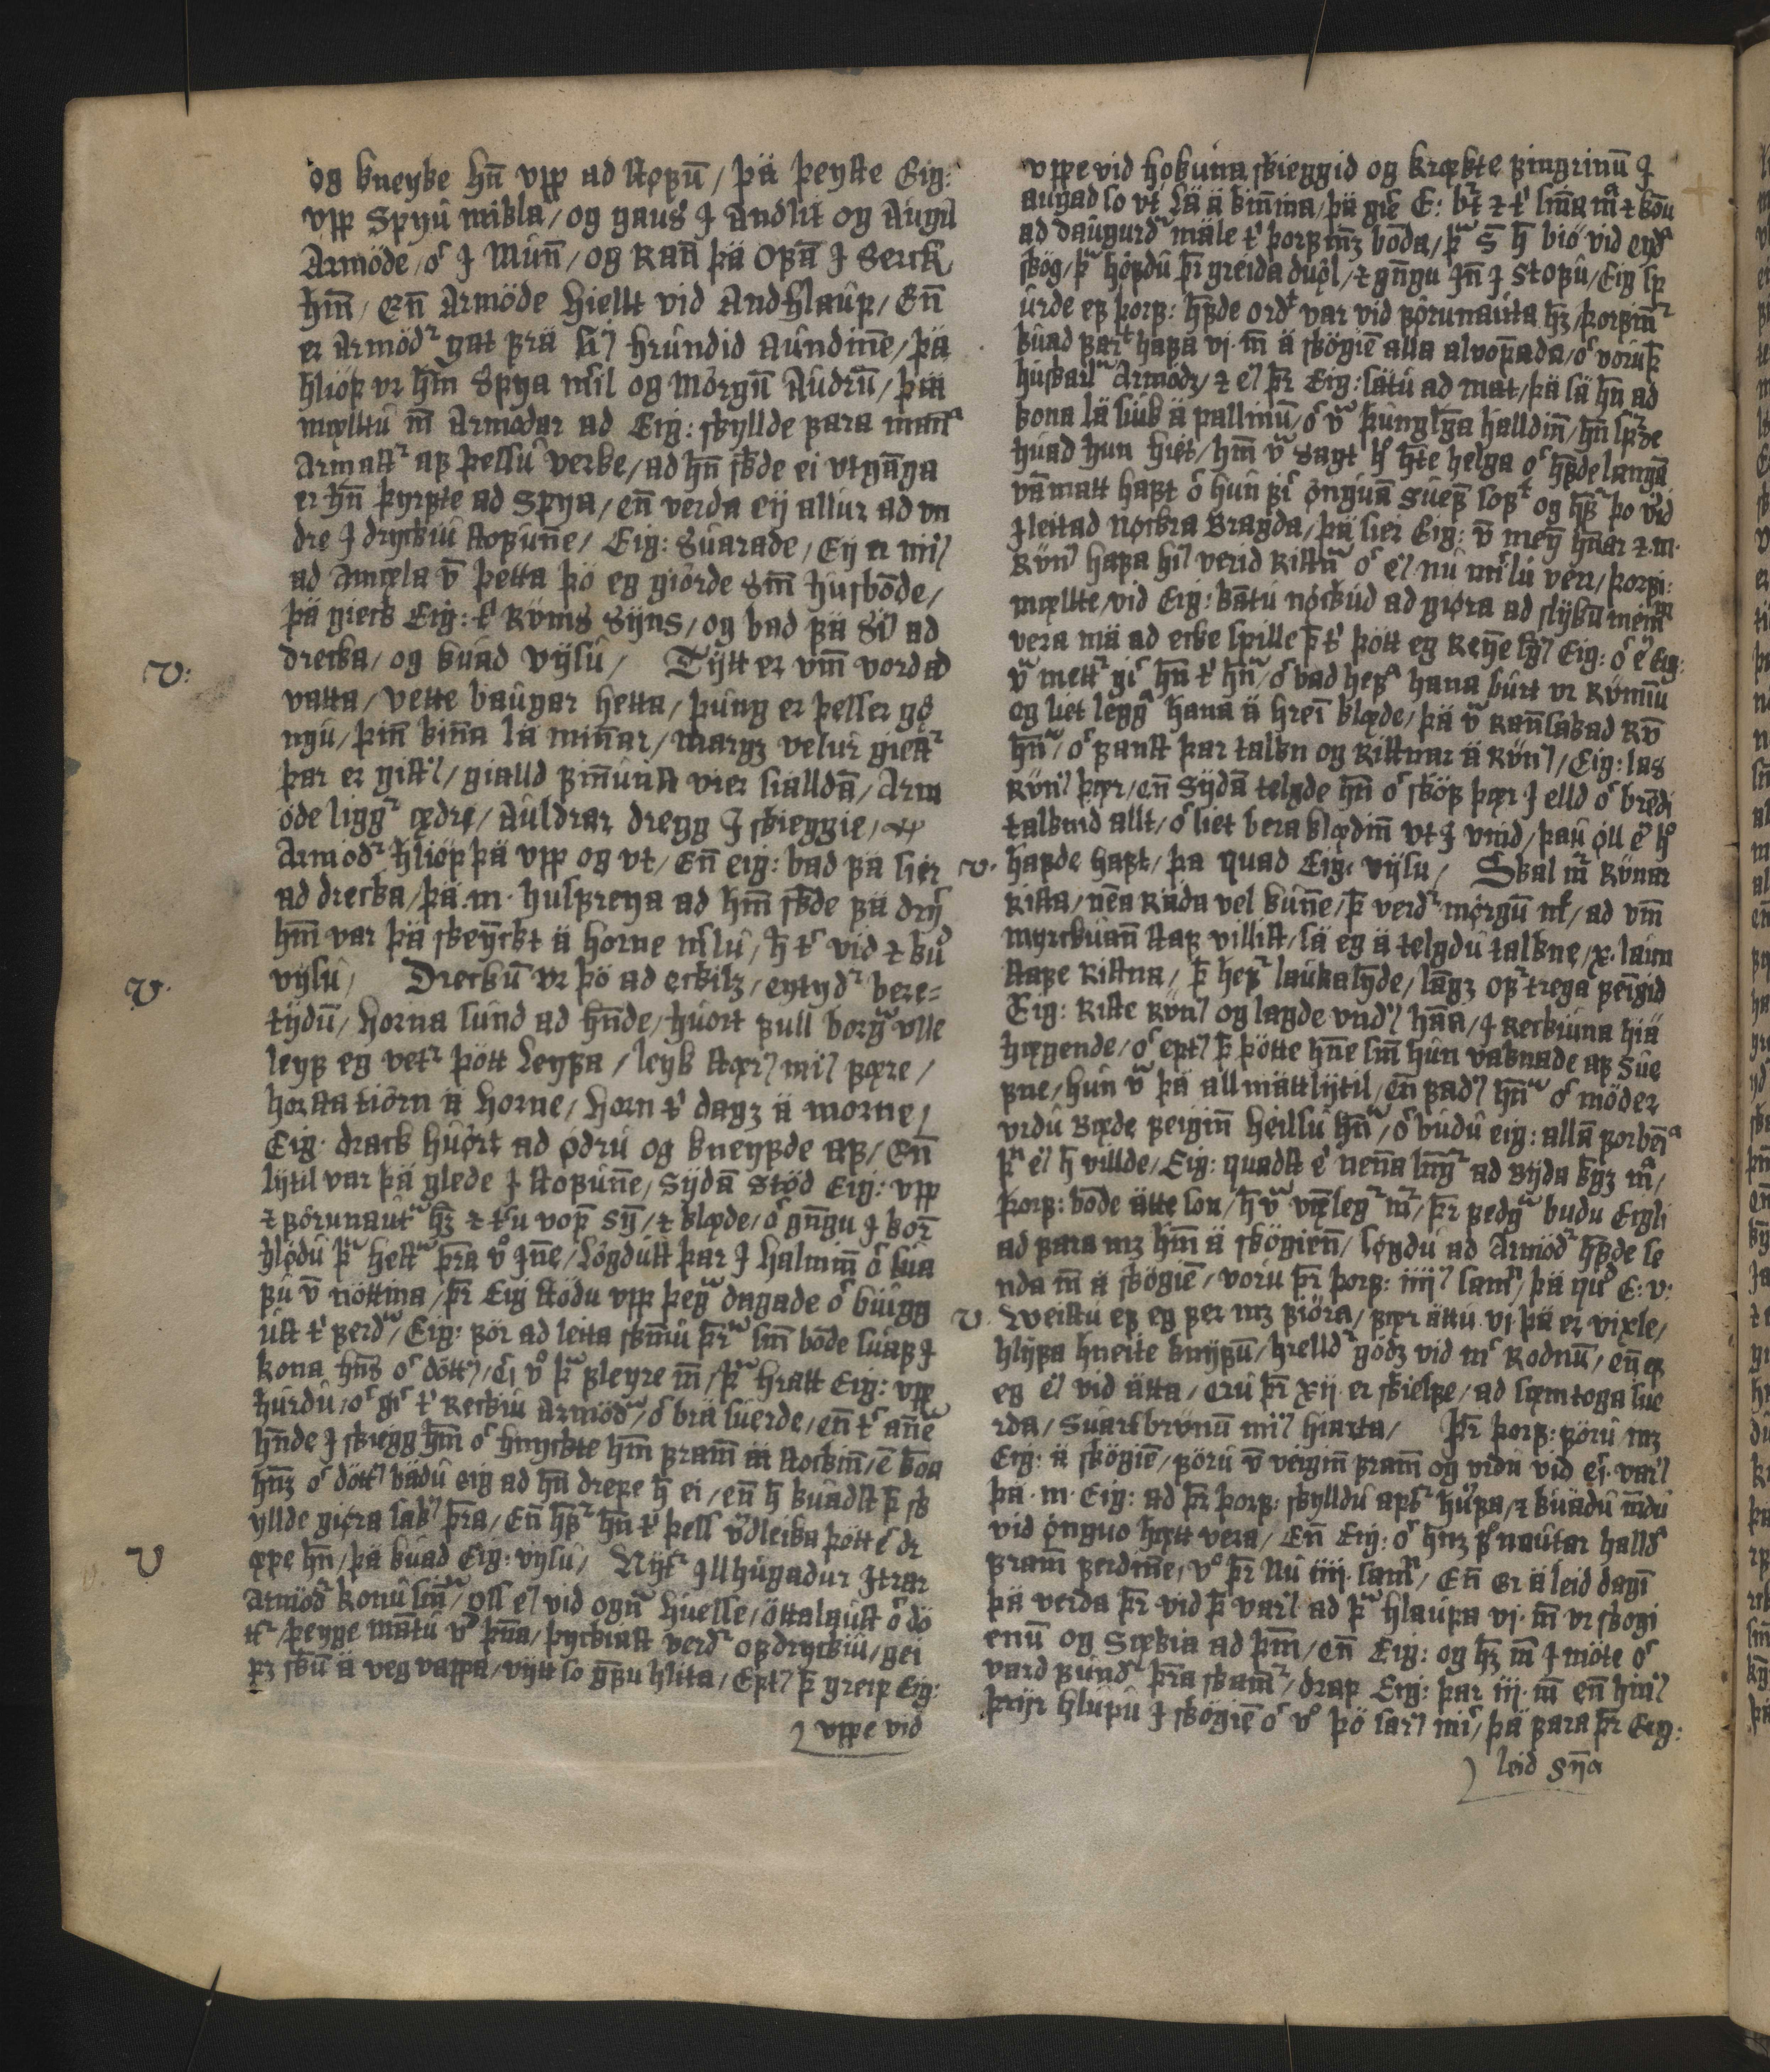 AM 128 fol - 45v